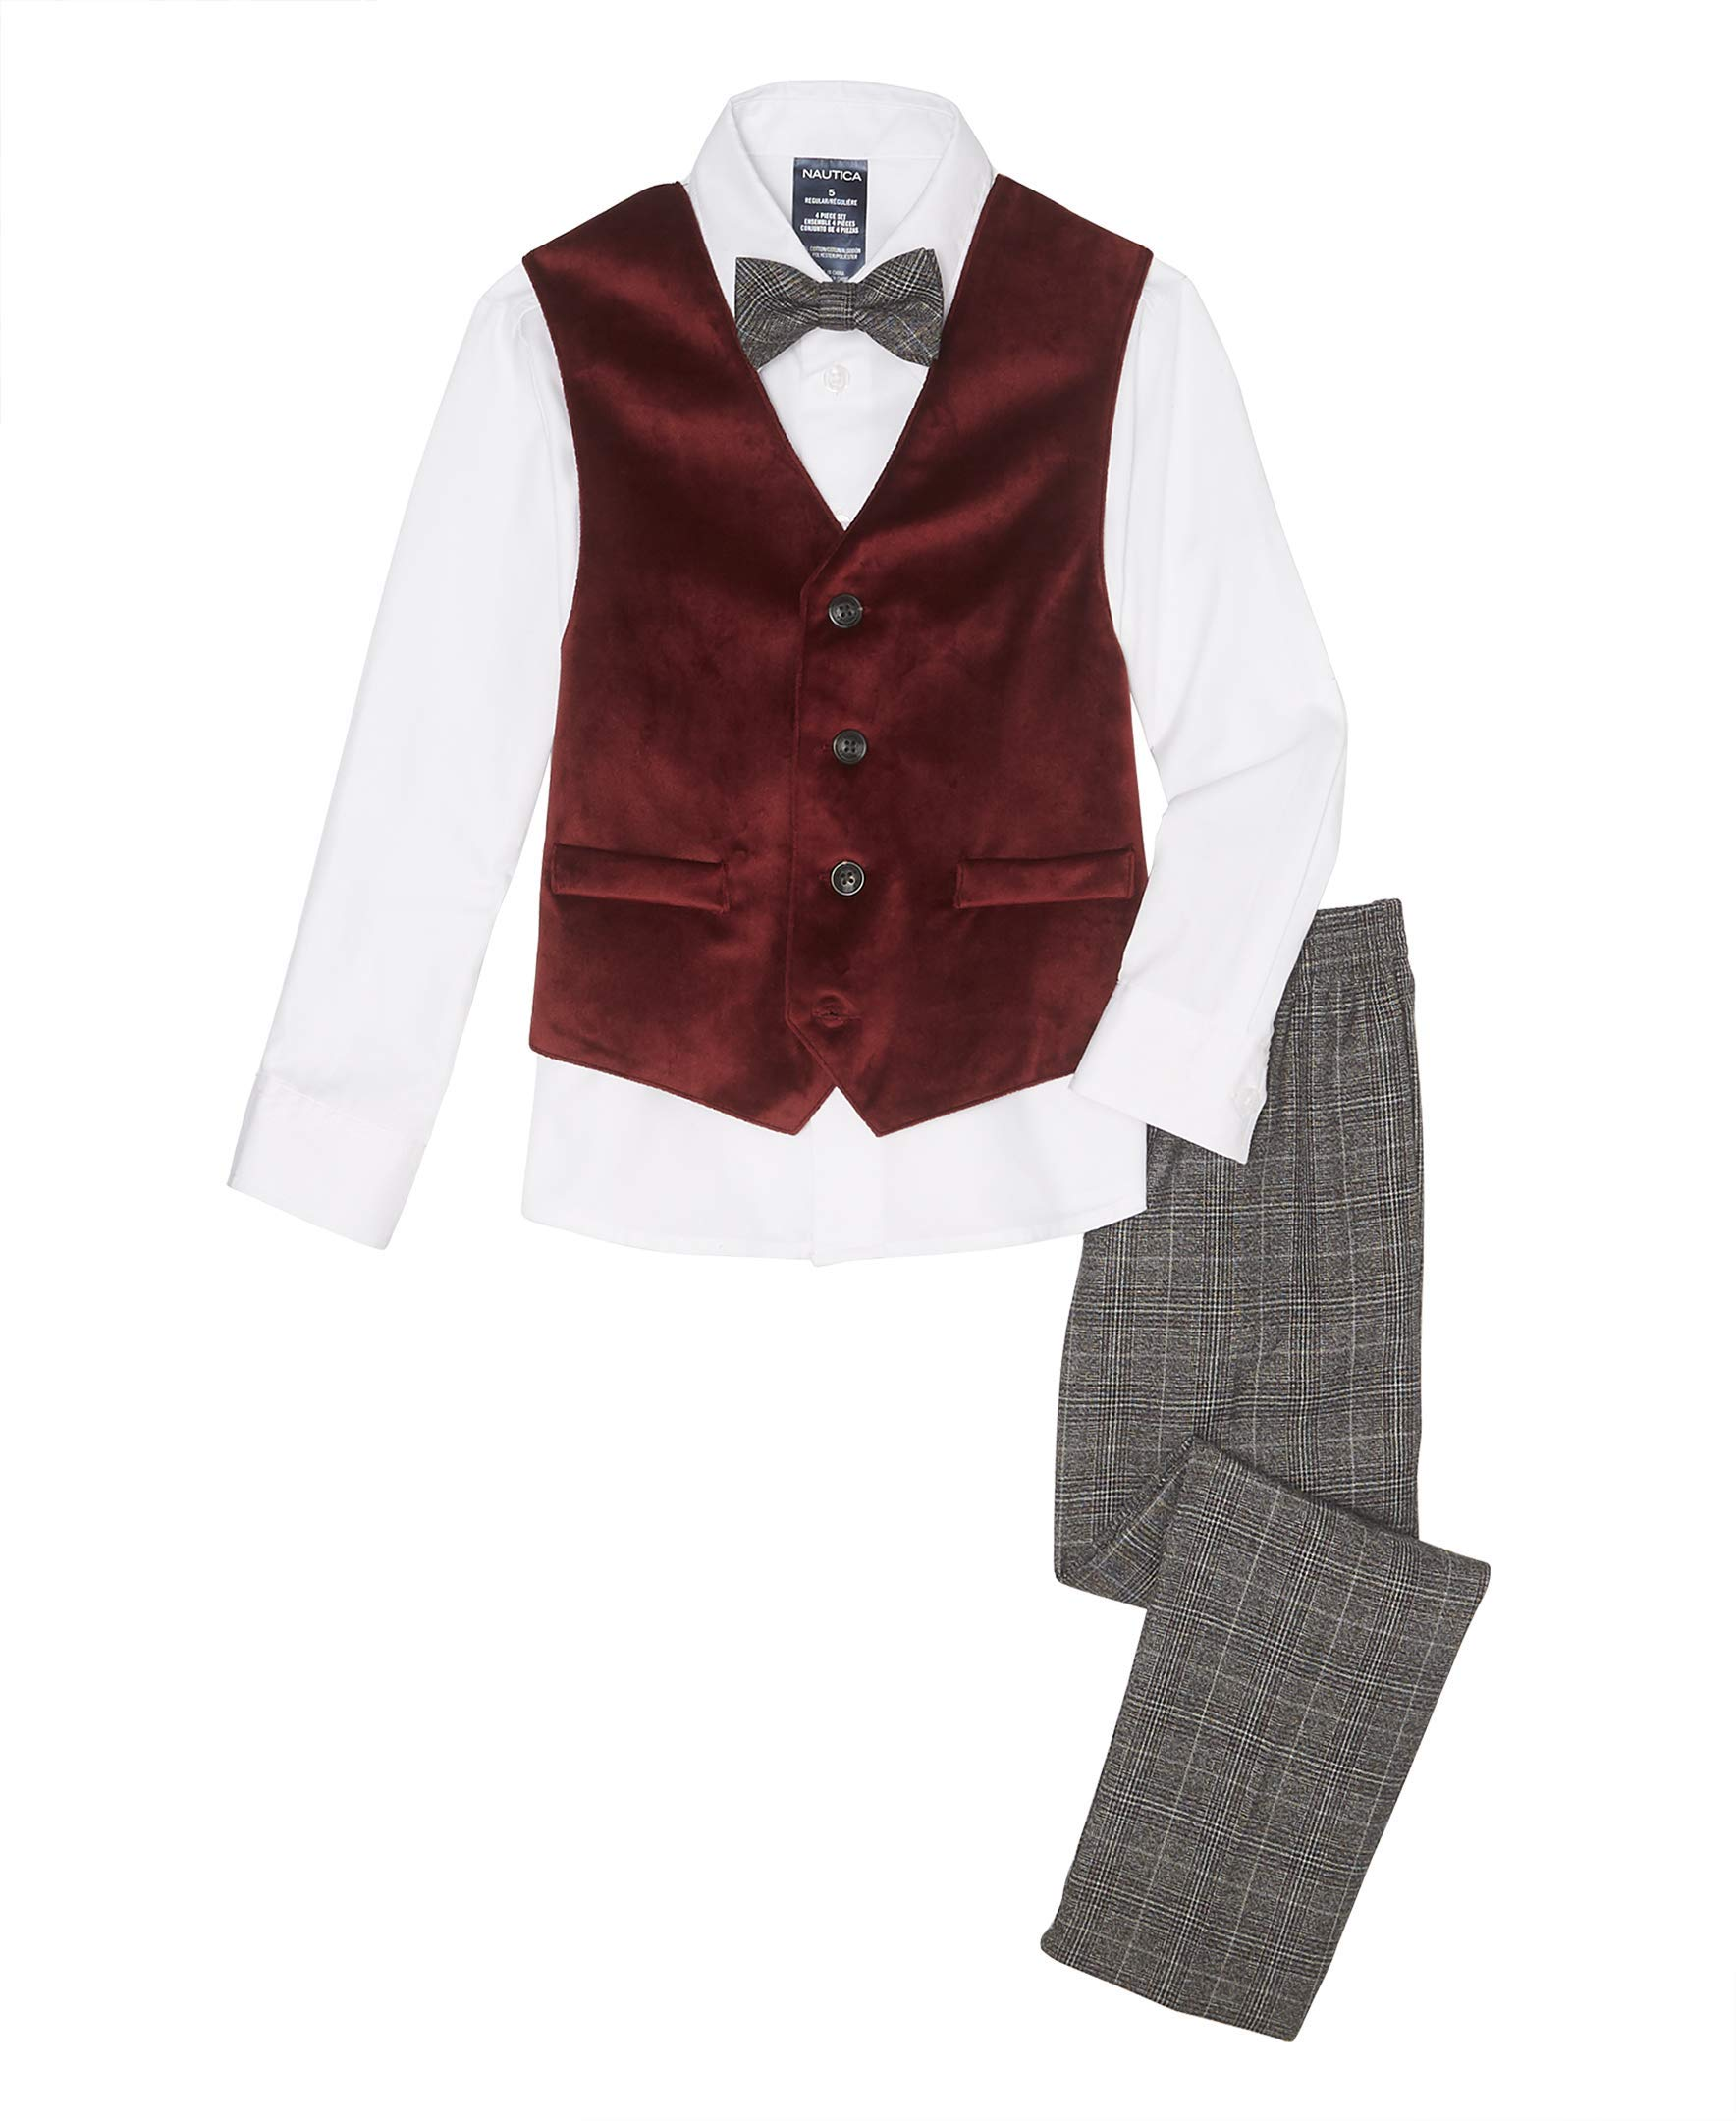 Nautica Boys' 4-Piece Vest Set with Dress Shirt, Bow Tie, Vest, and Pants, velvet dark red, 14